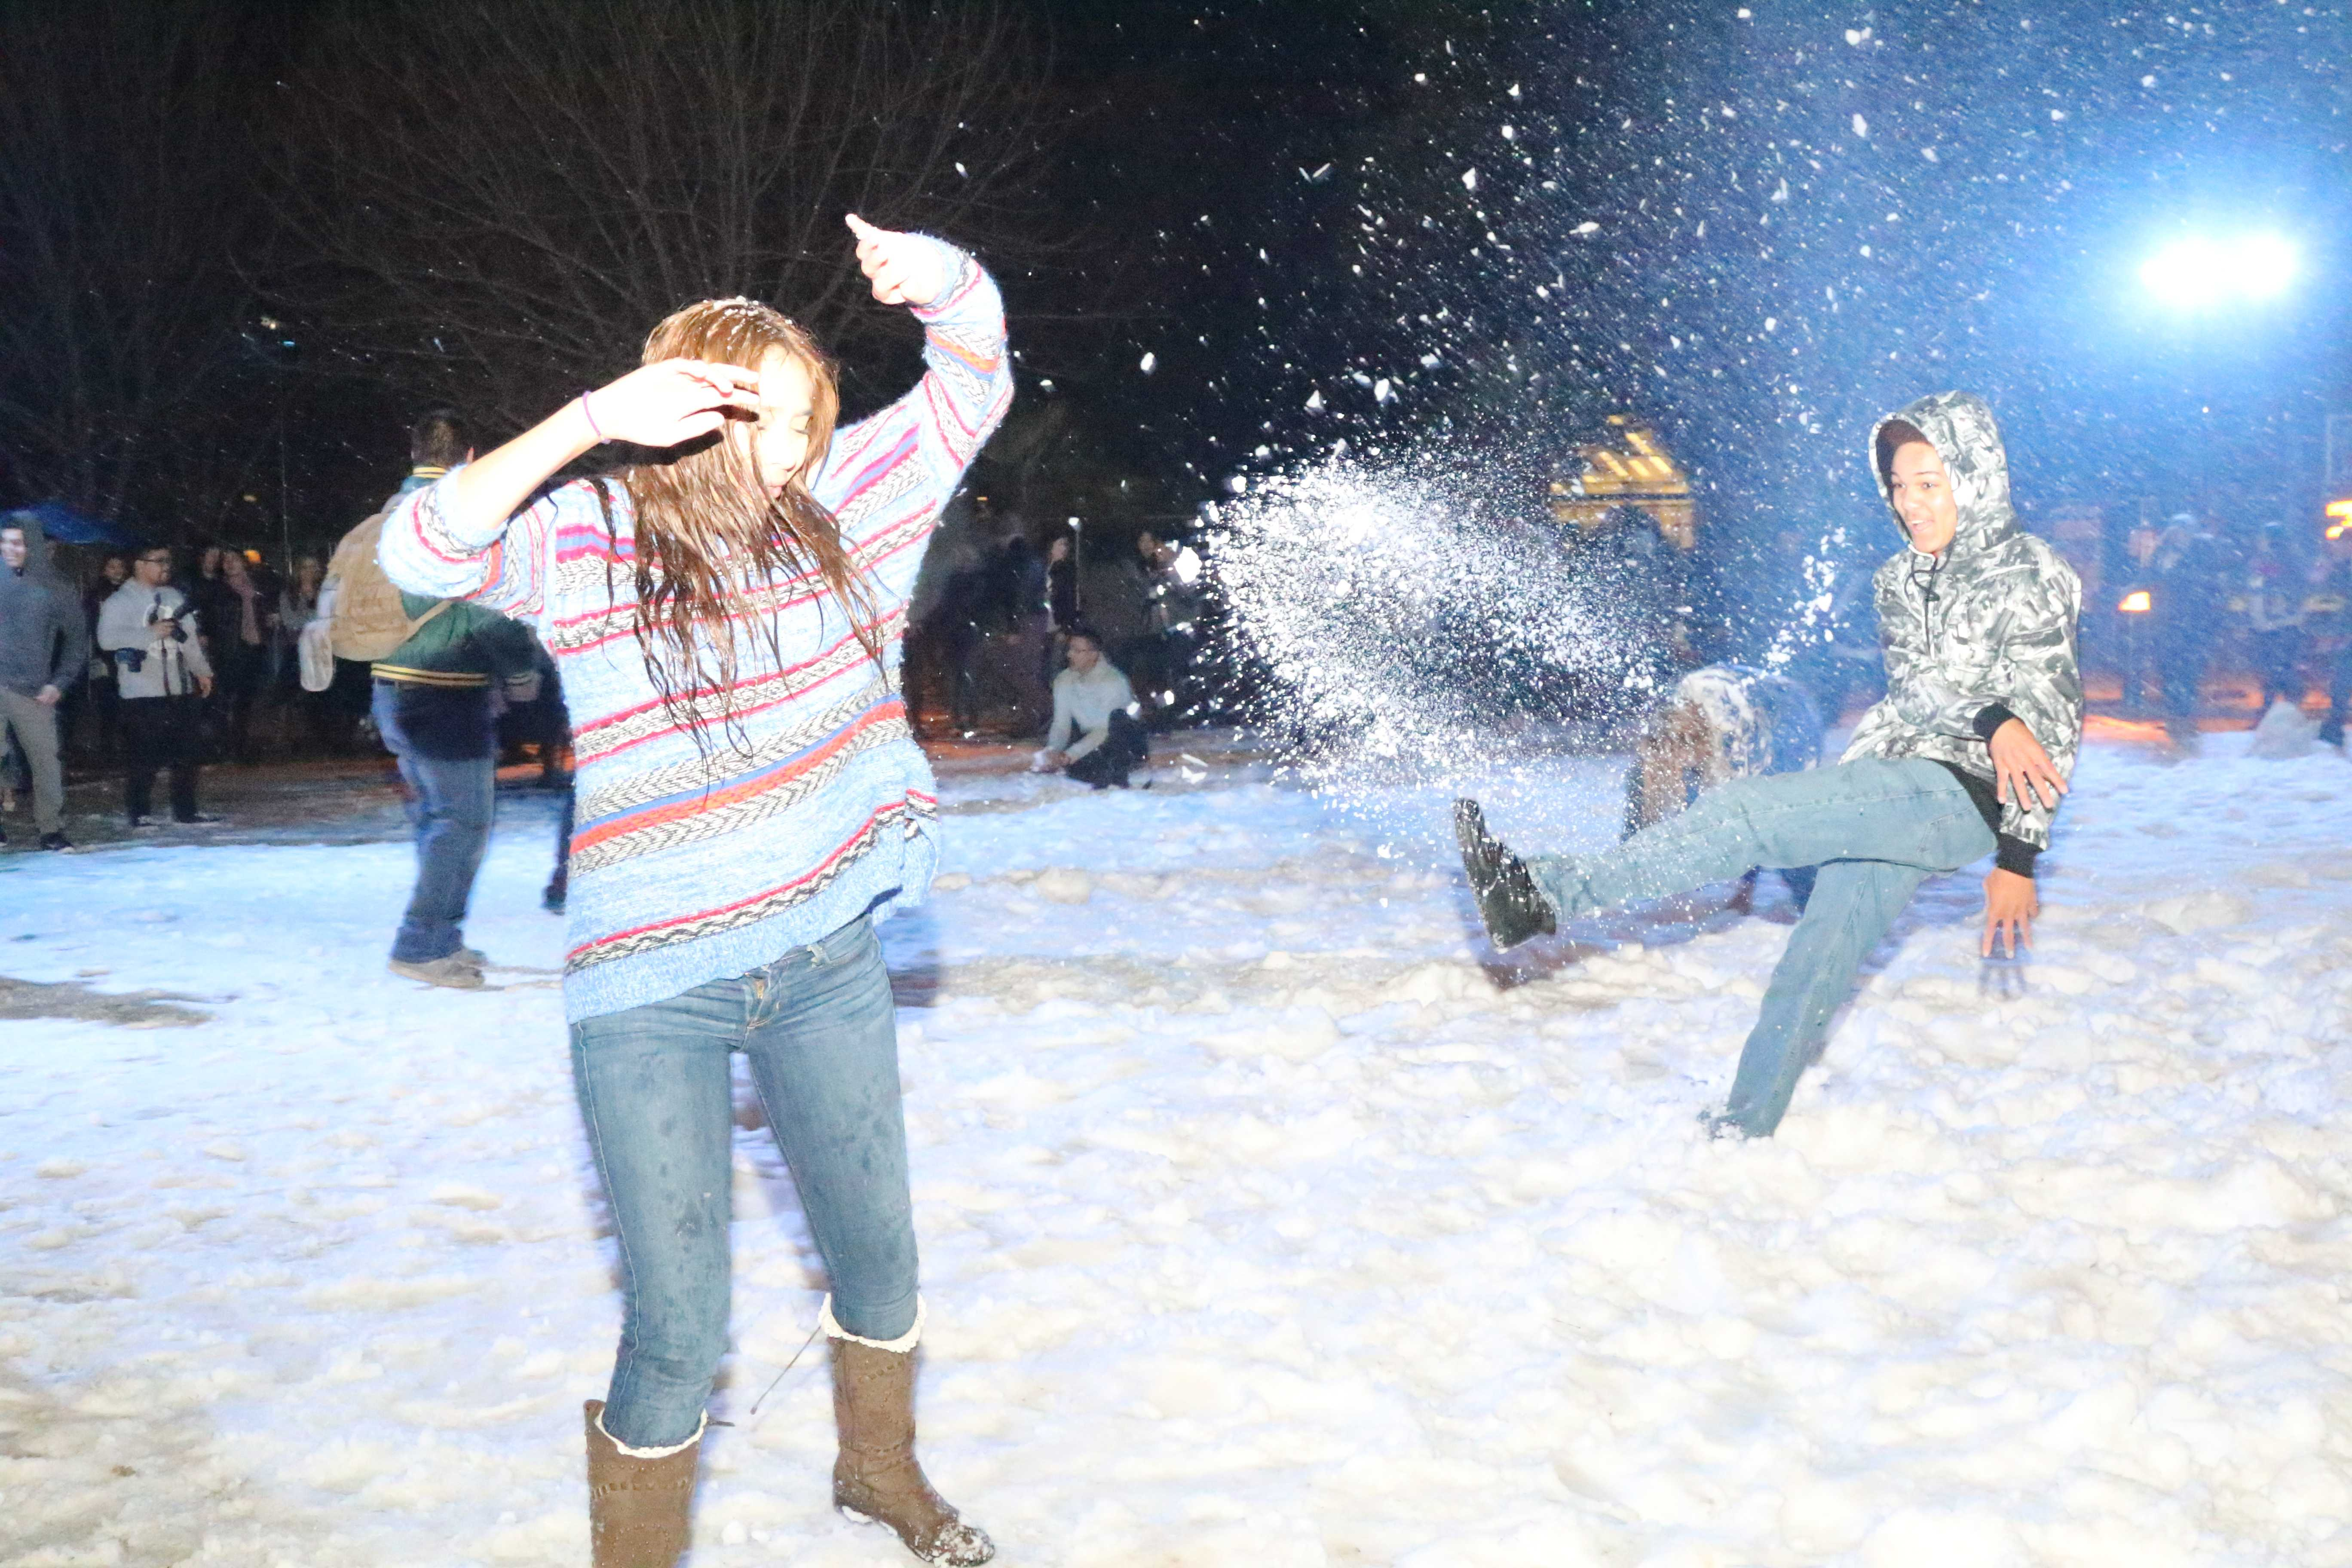 Runner Nights: Winter Wonderland